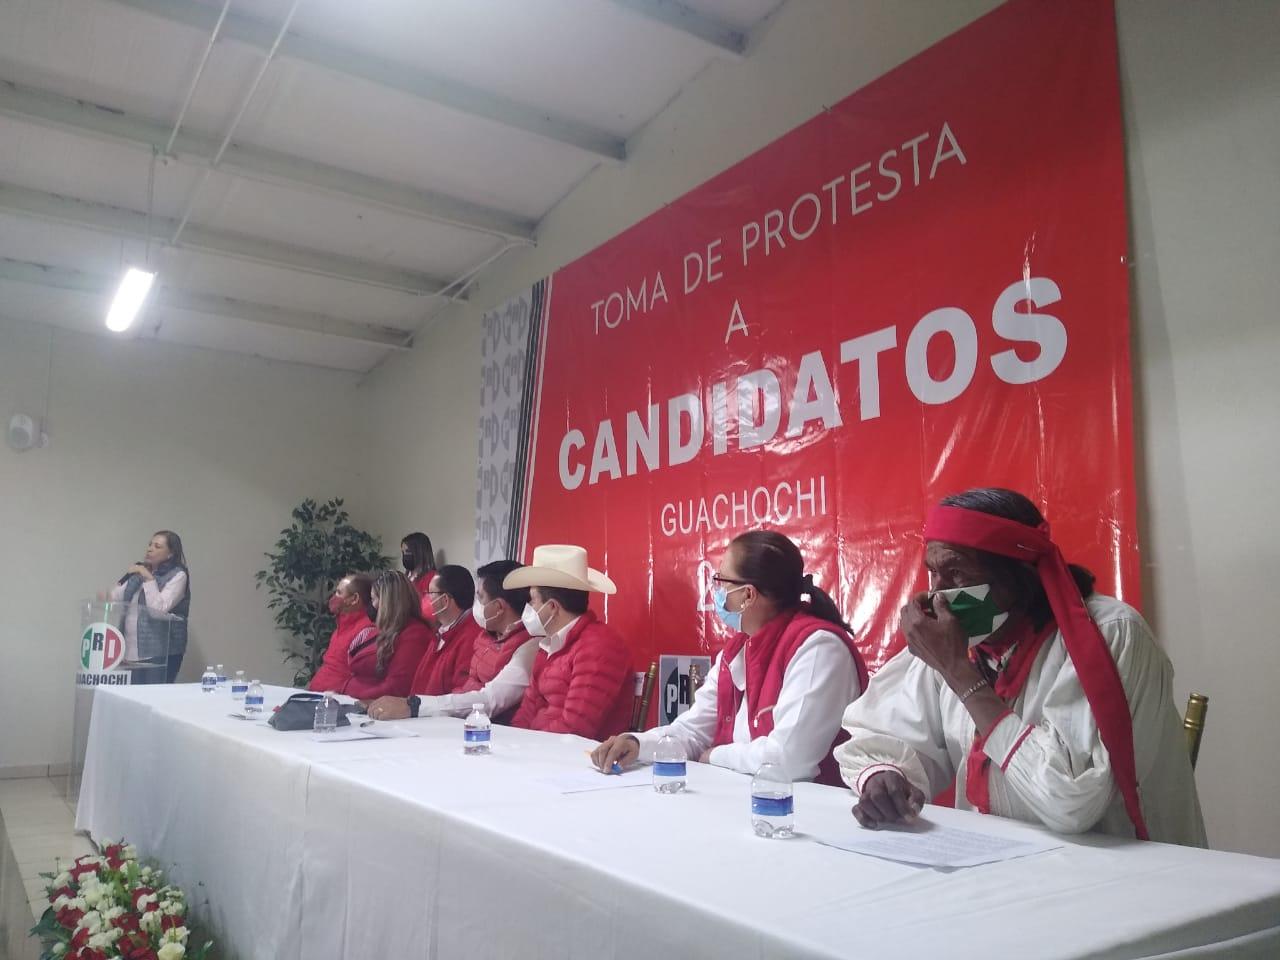 Pepe Yáñez y Dayra González ya son Candidatos Oficiales del PRI en Guachochi